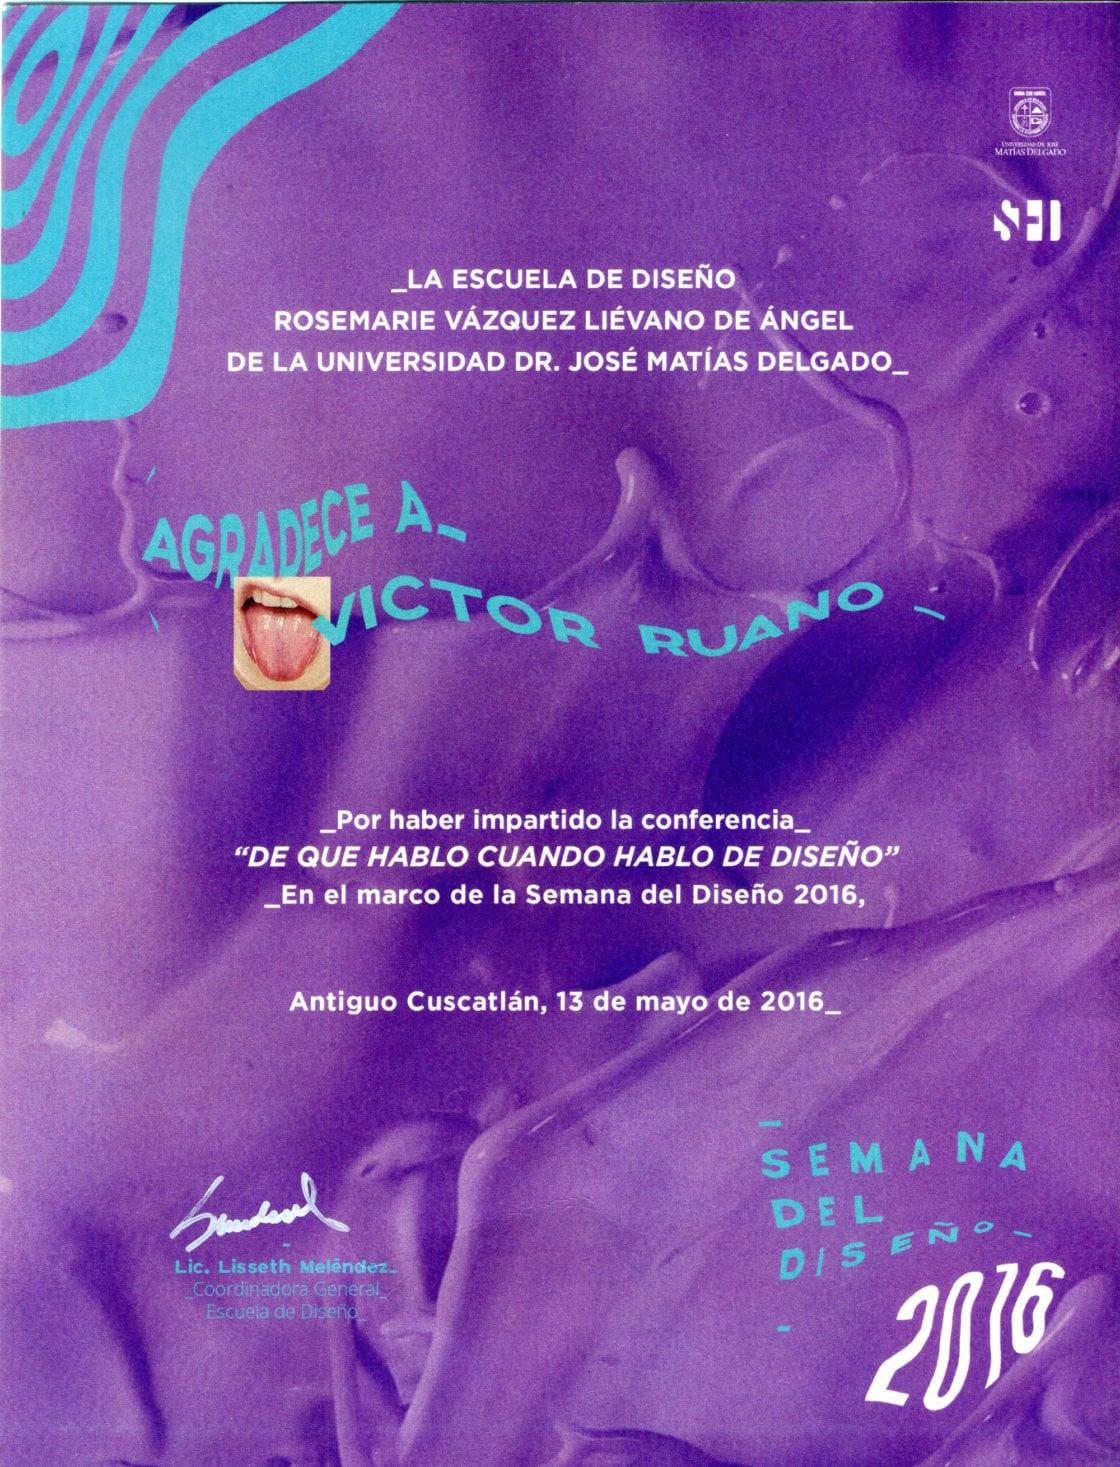 diploma-UDJMD-sed-victor-ruano-santasombra